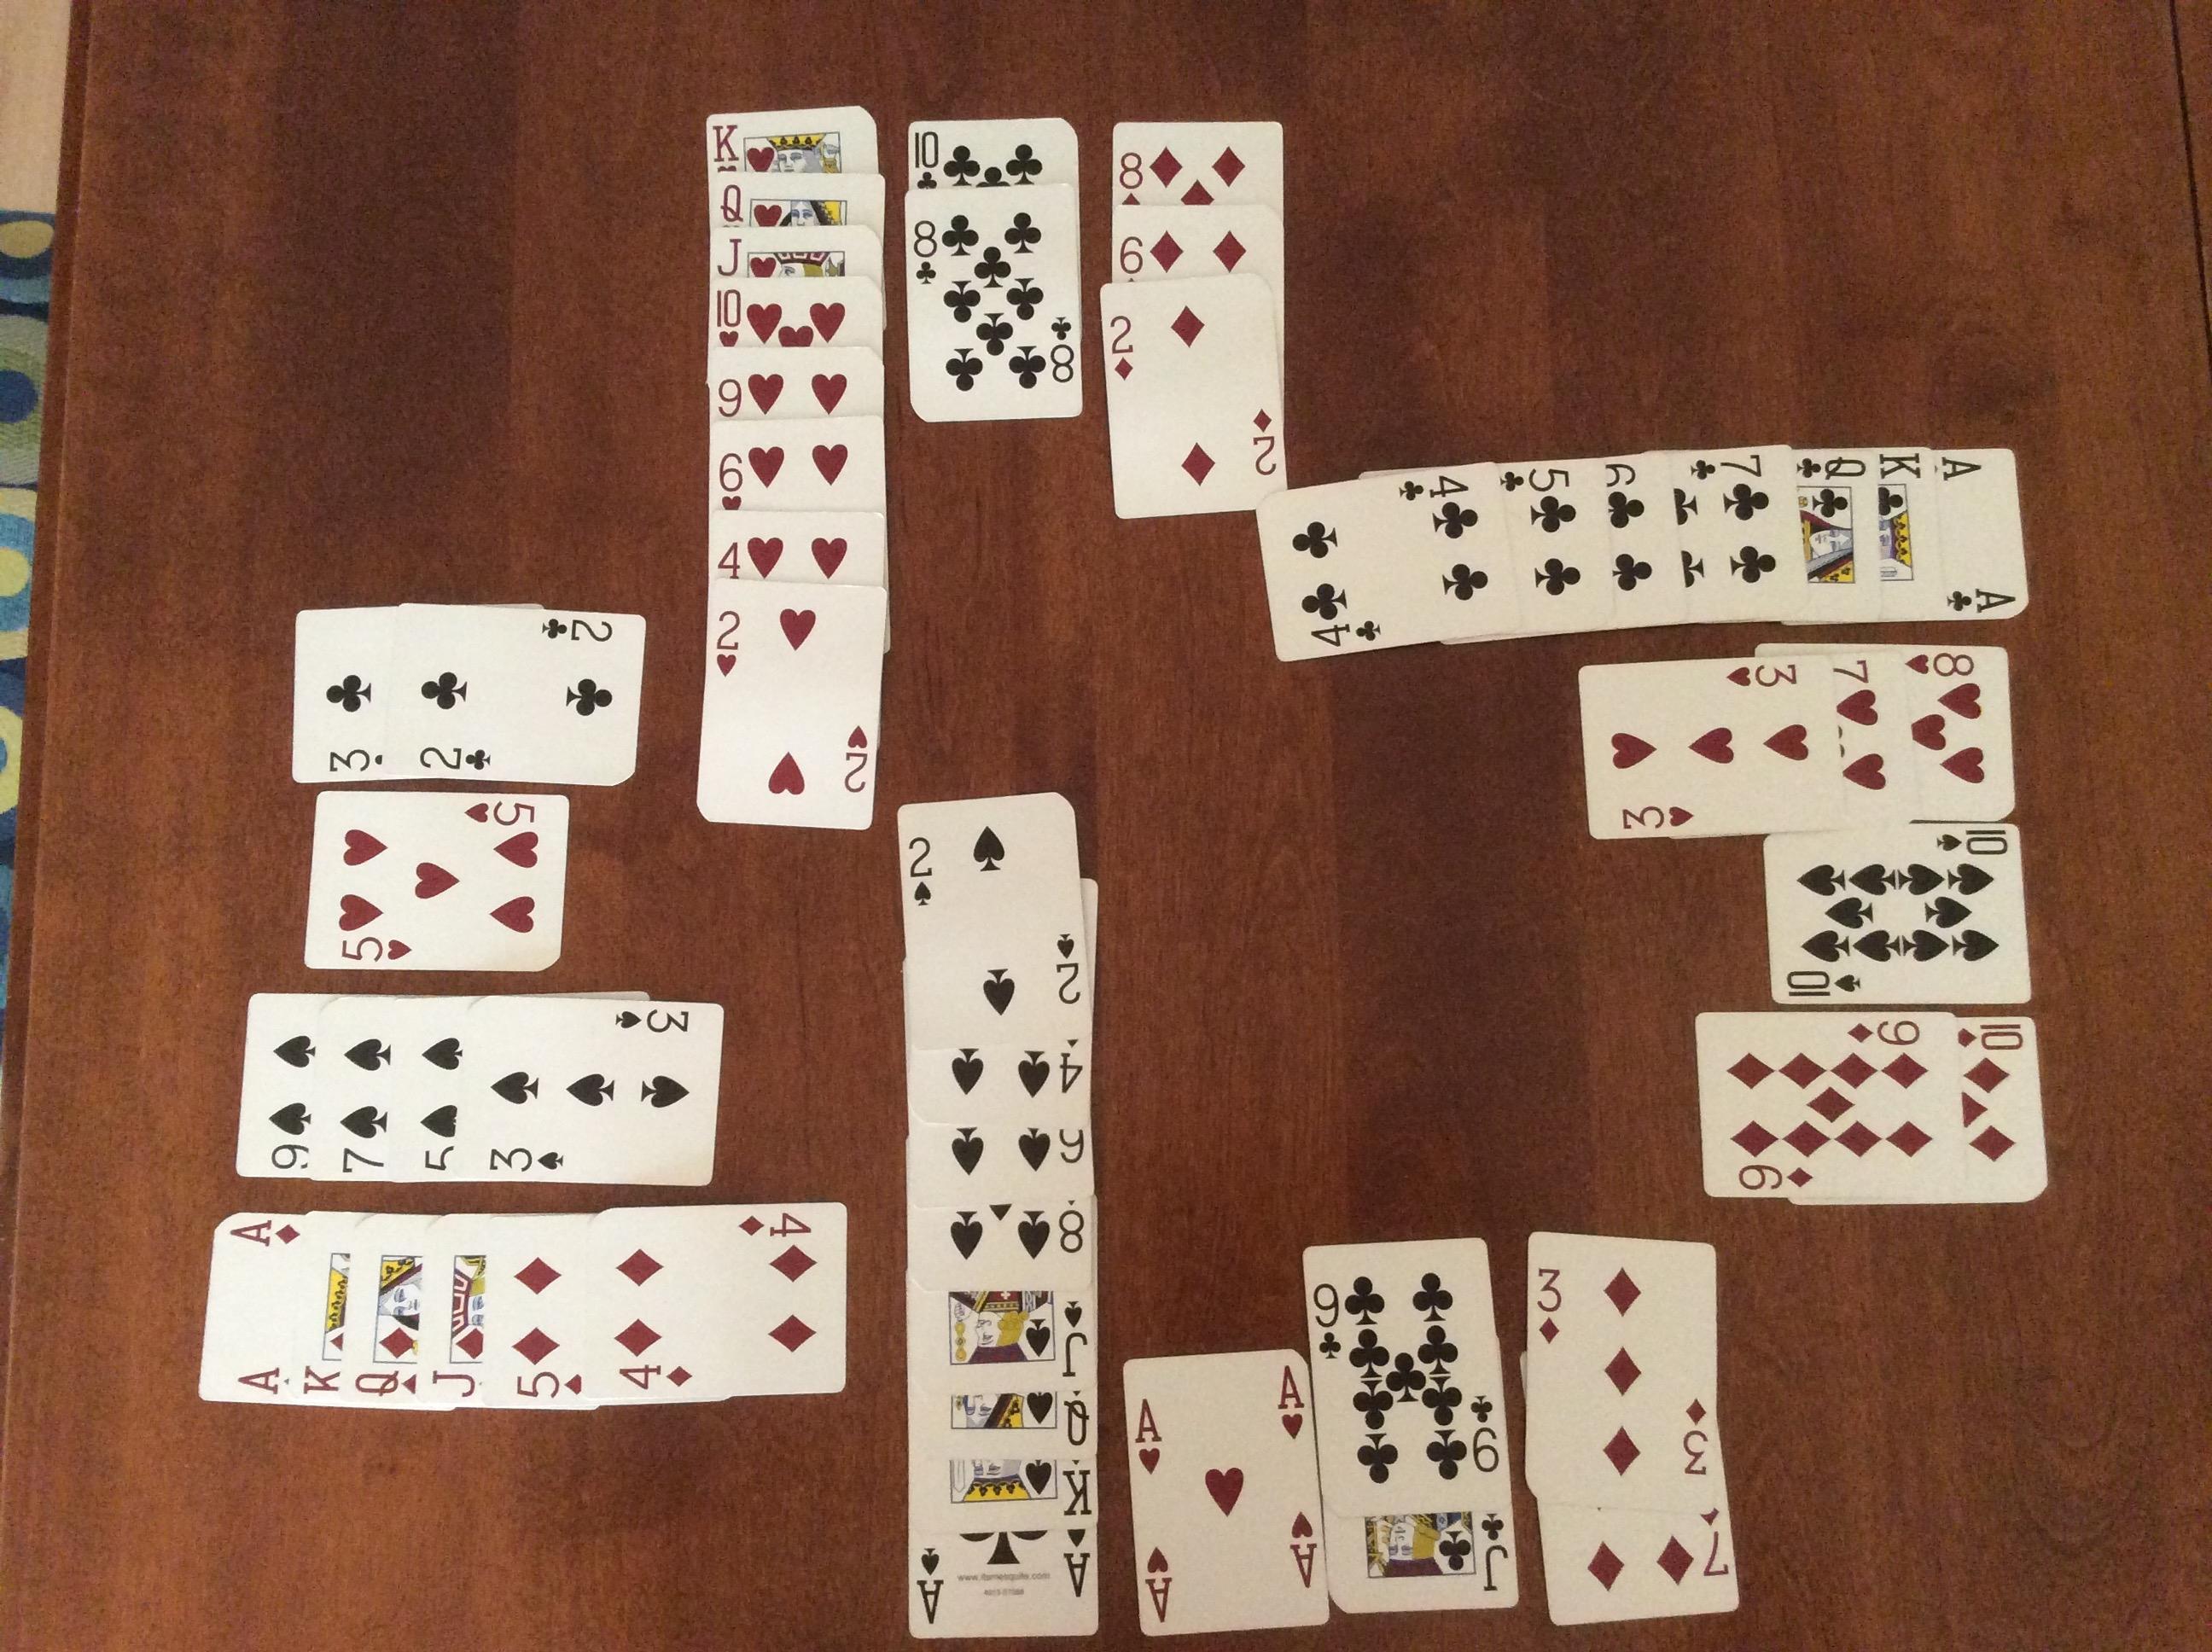 The Bridge game